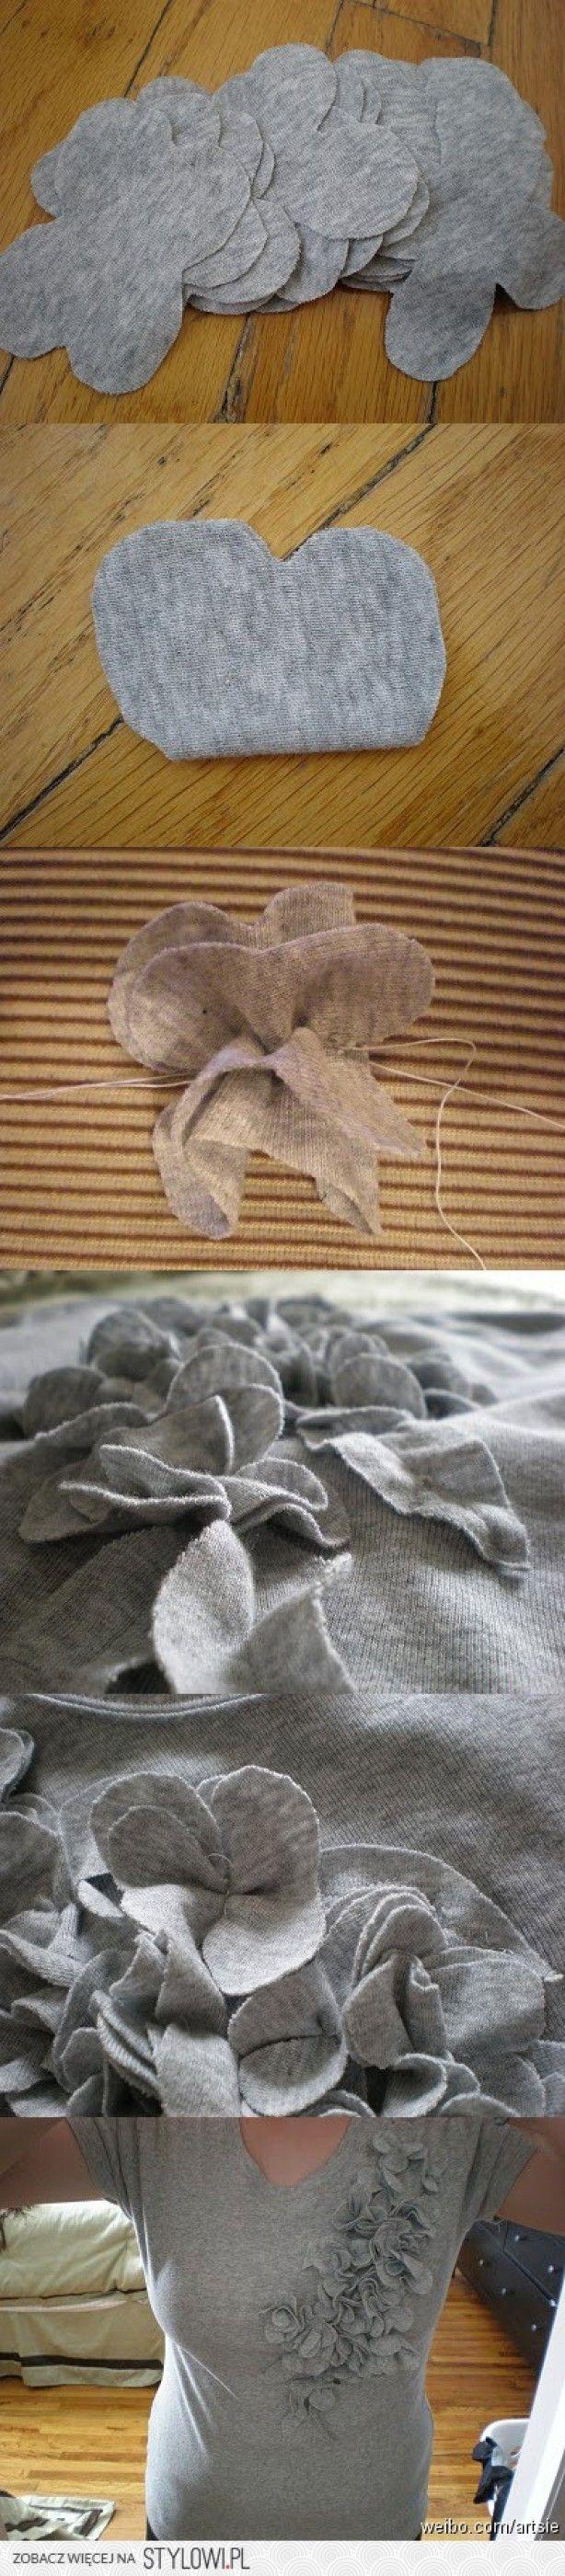 fabric flowers for tshirt embellishment